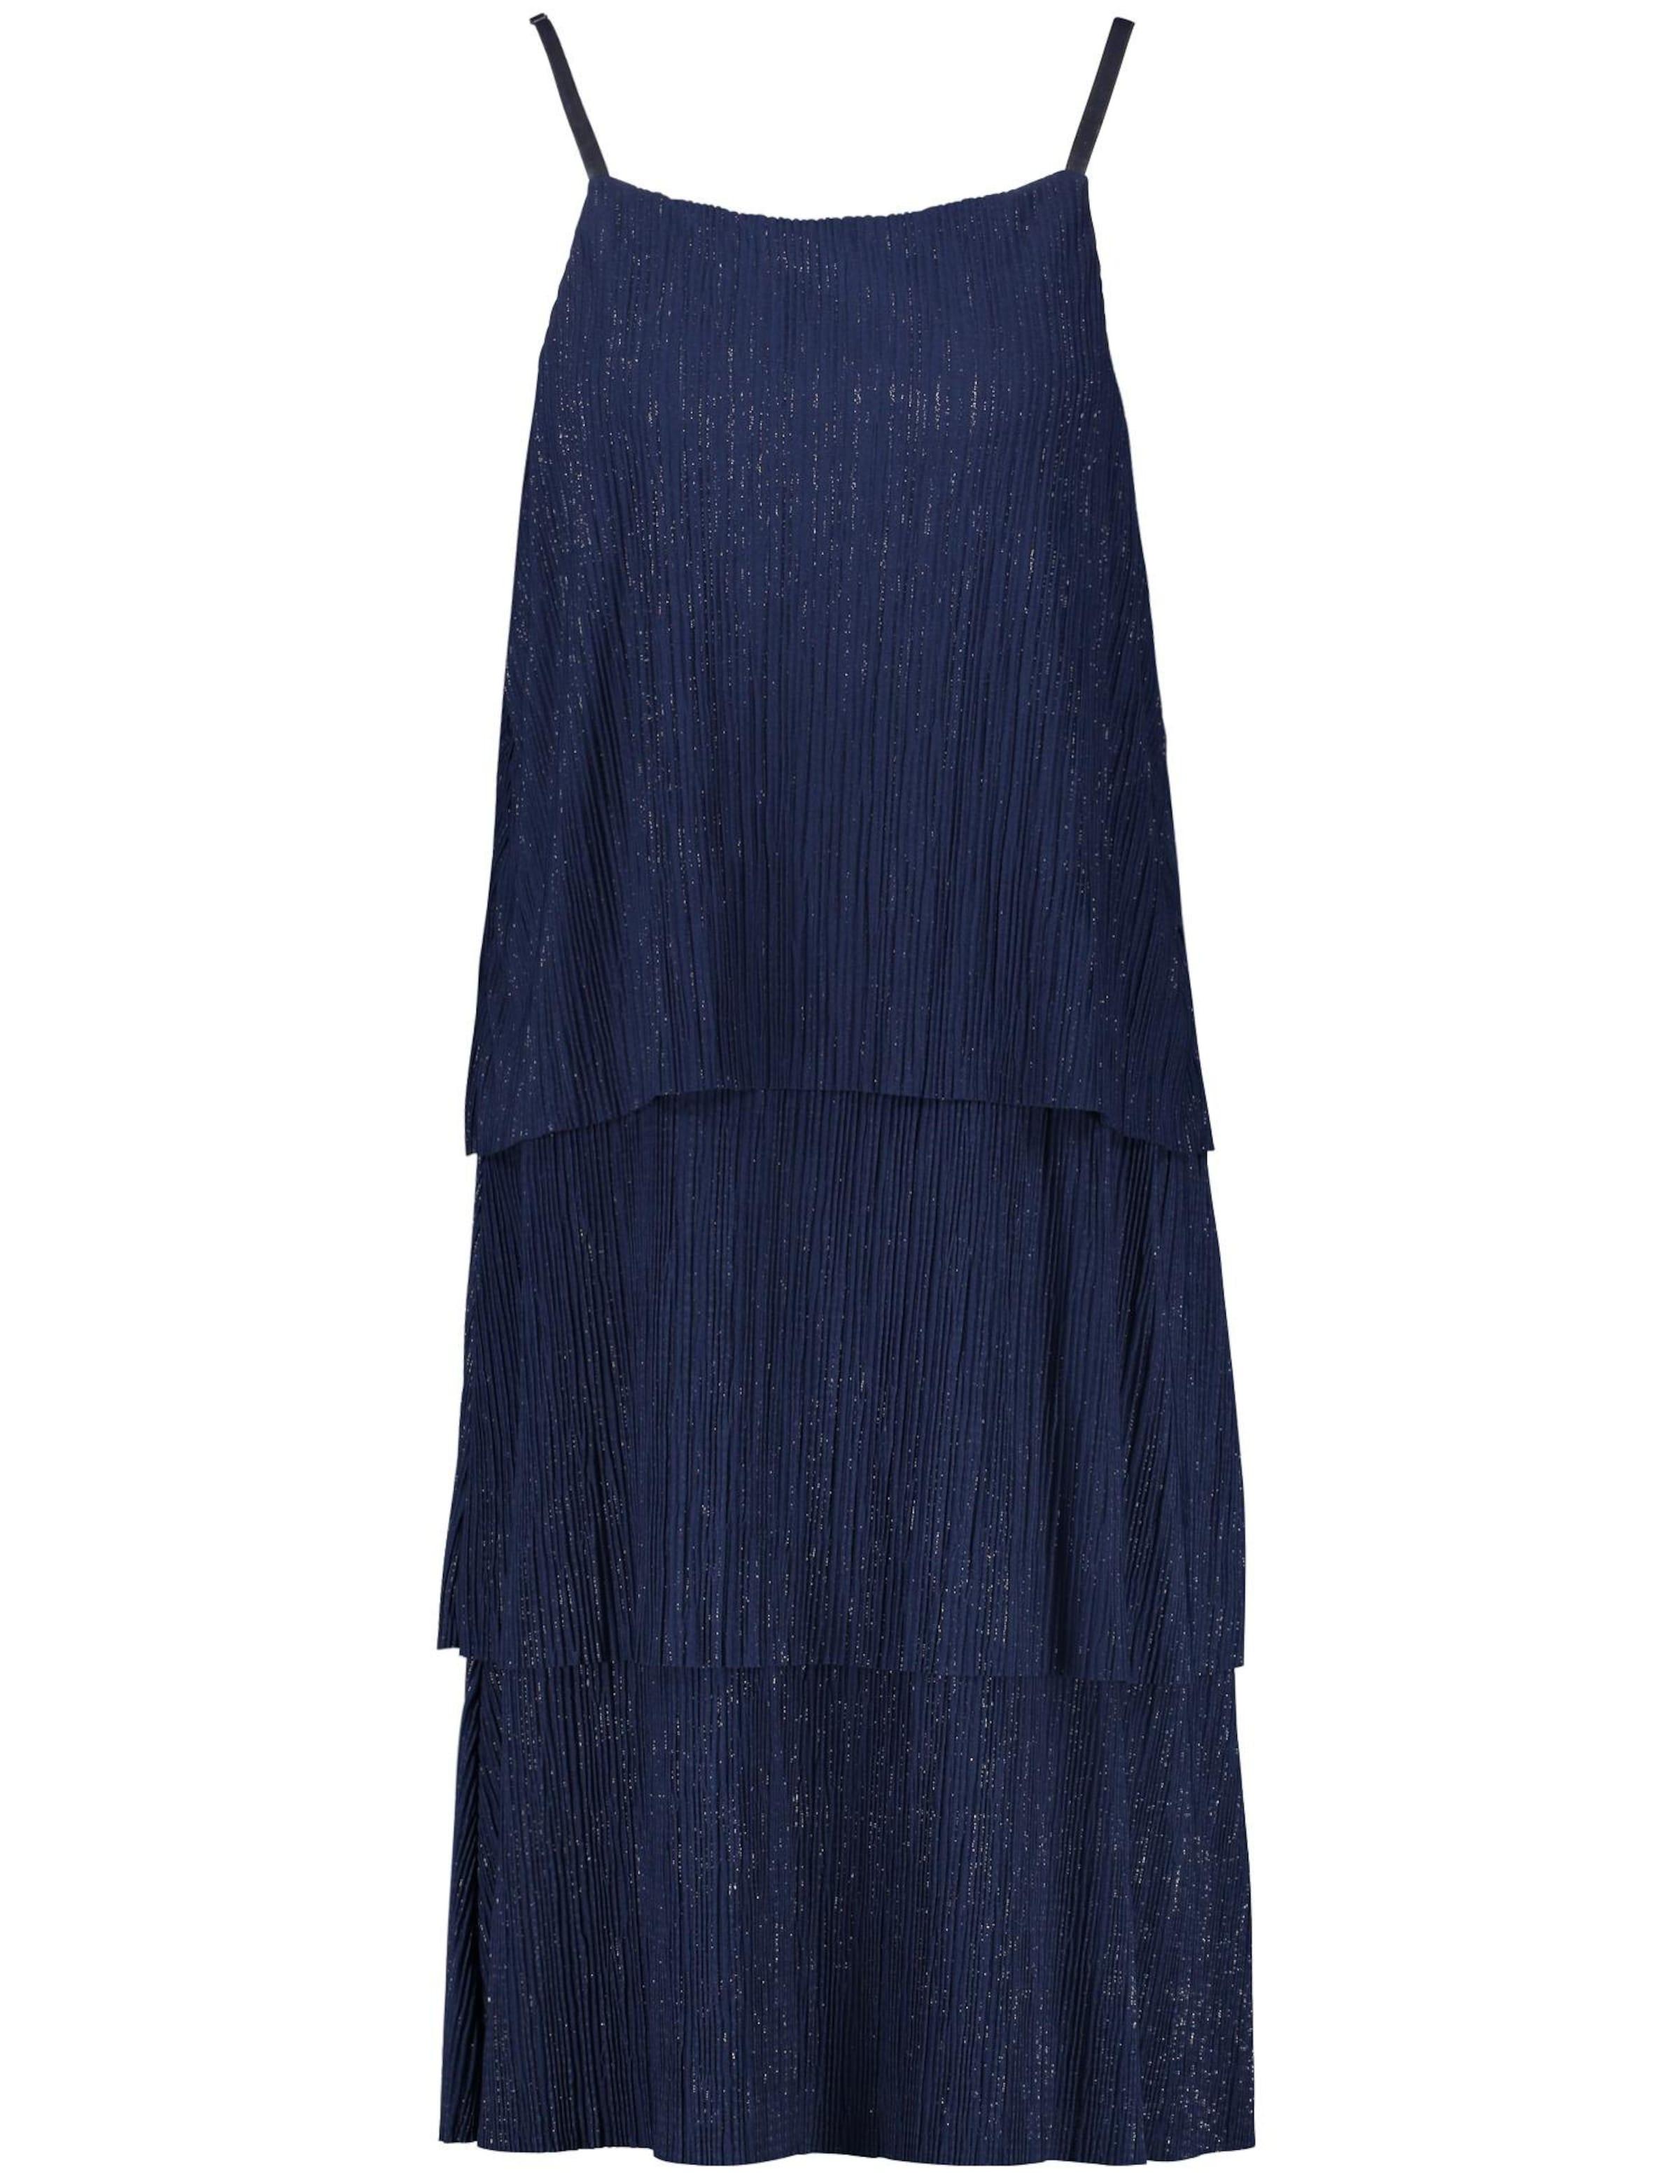 Kleid Taifun Kleid Kleid Dunkelblau In Dunkelblau In Dunkelblau Taifun Taifun Taifun In In Kleid 8OnwP0k